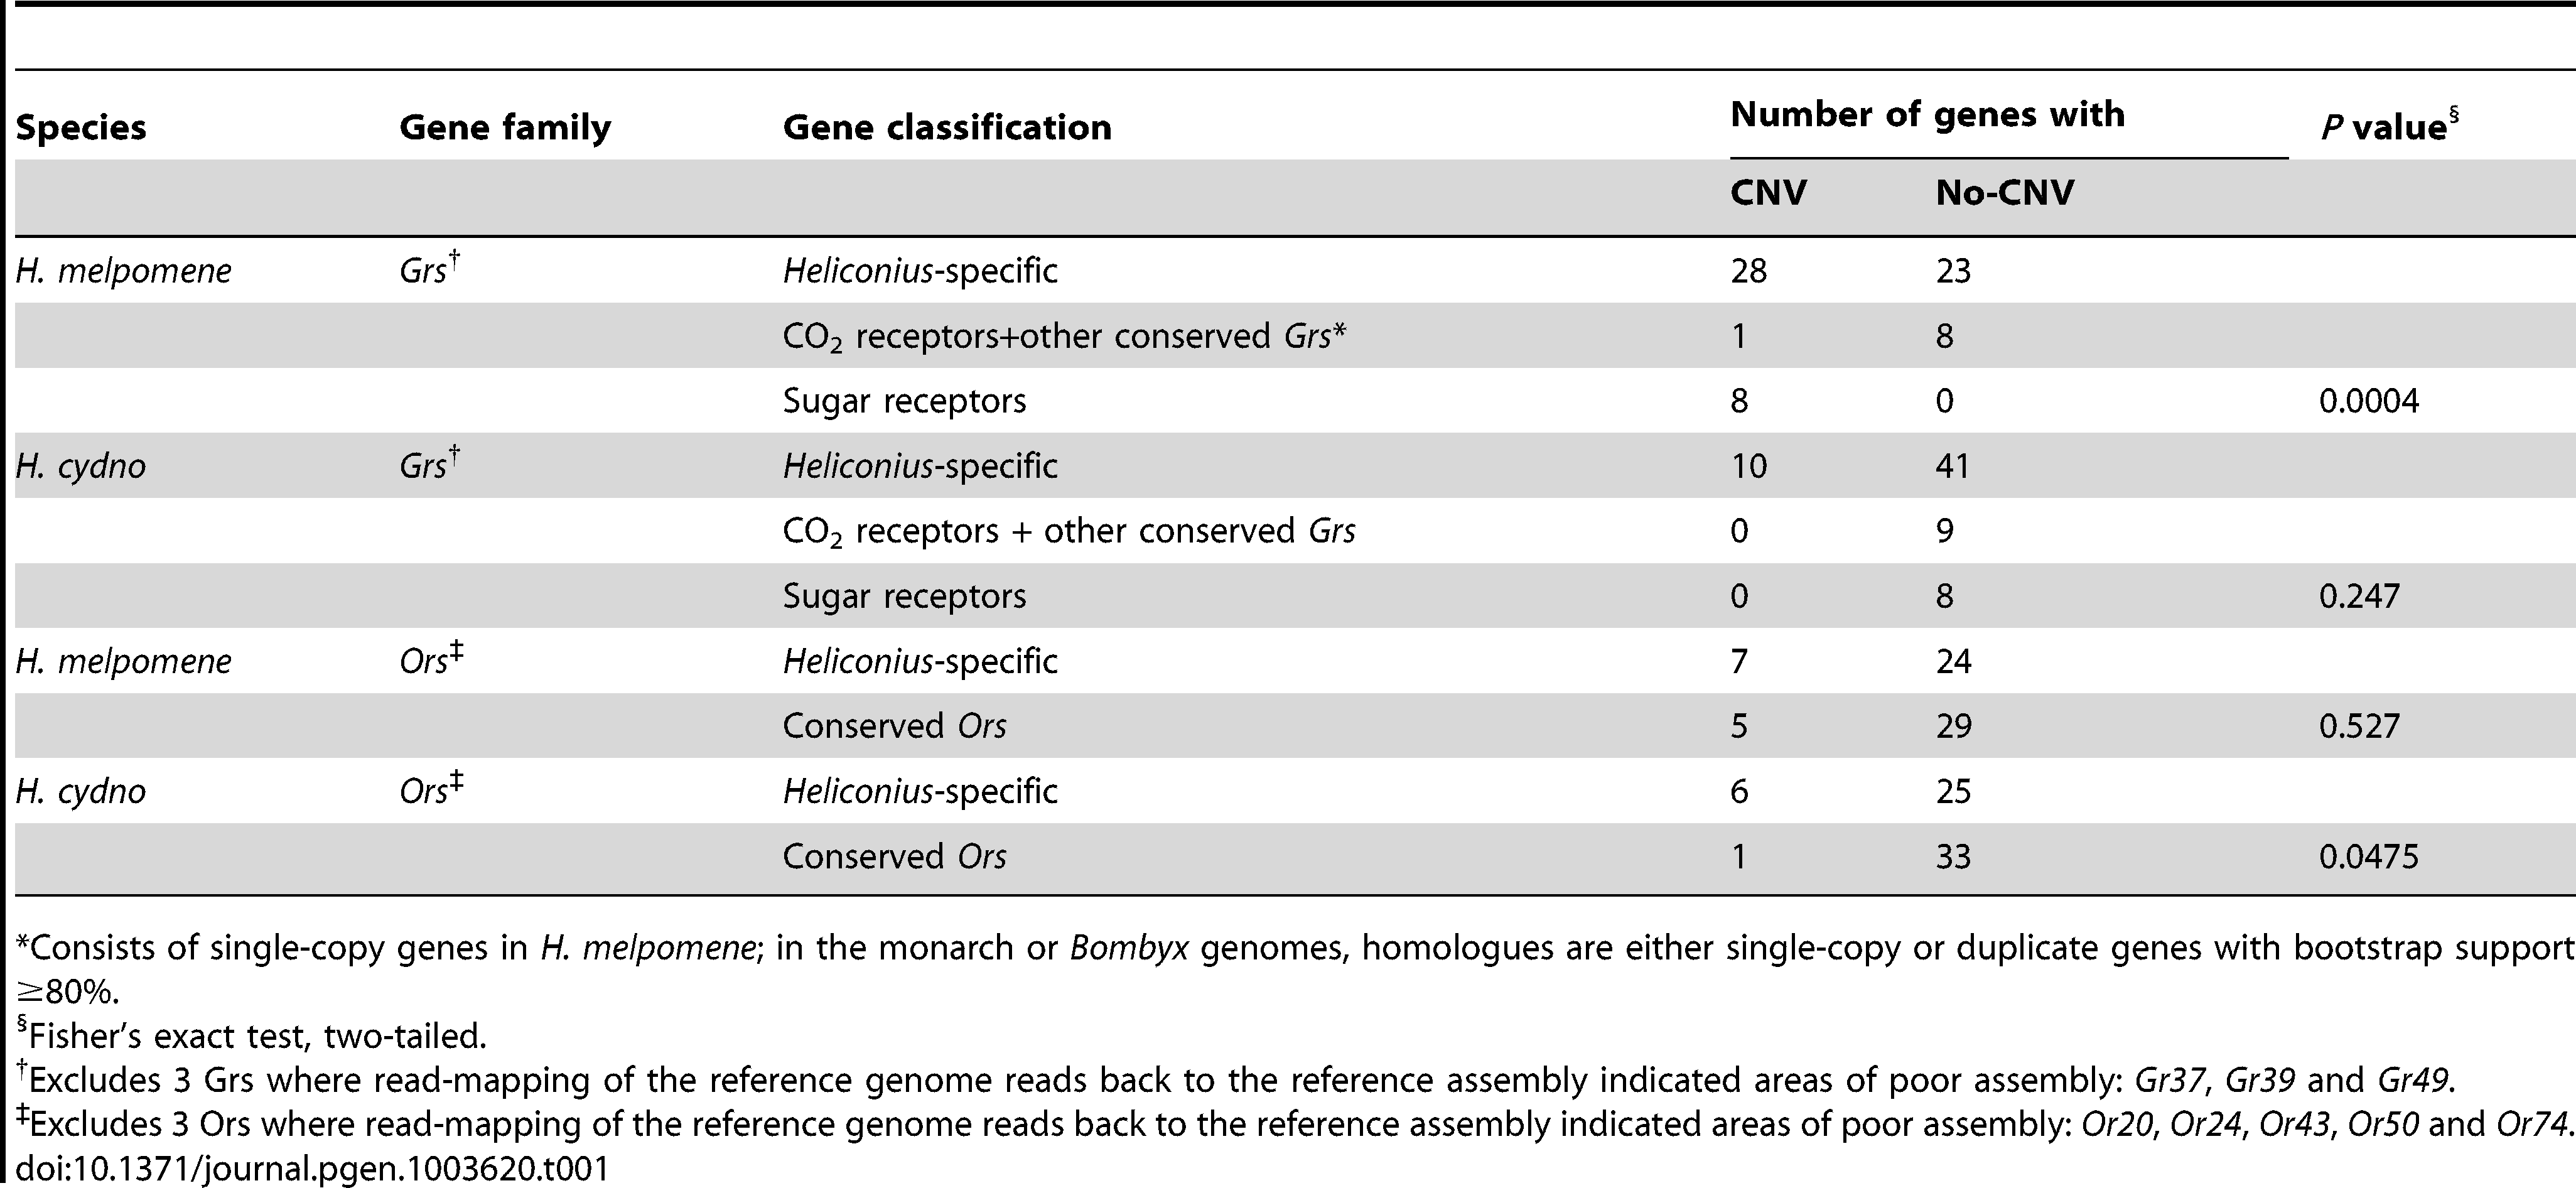 Relationship between evolutionarily-conserved genes and copy-number variation (CNV).